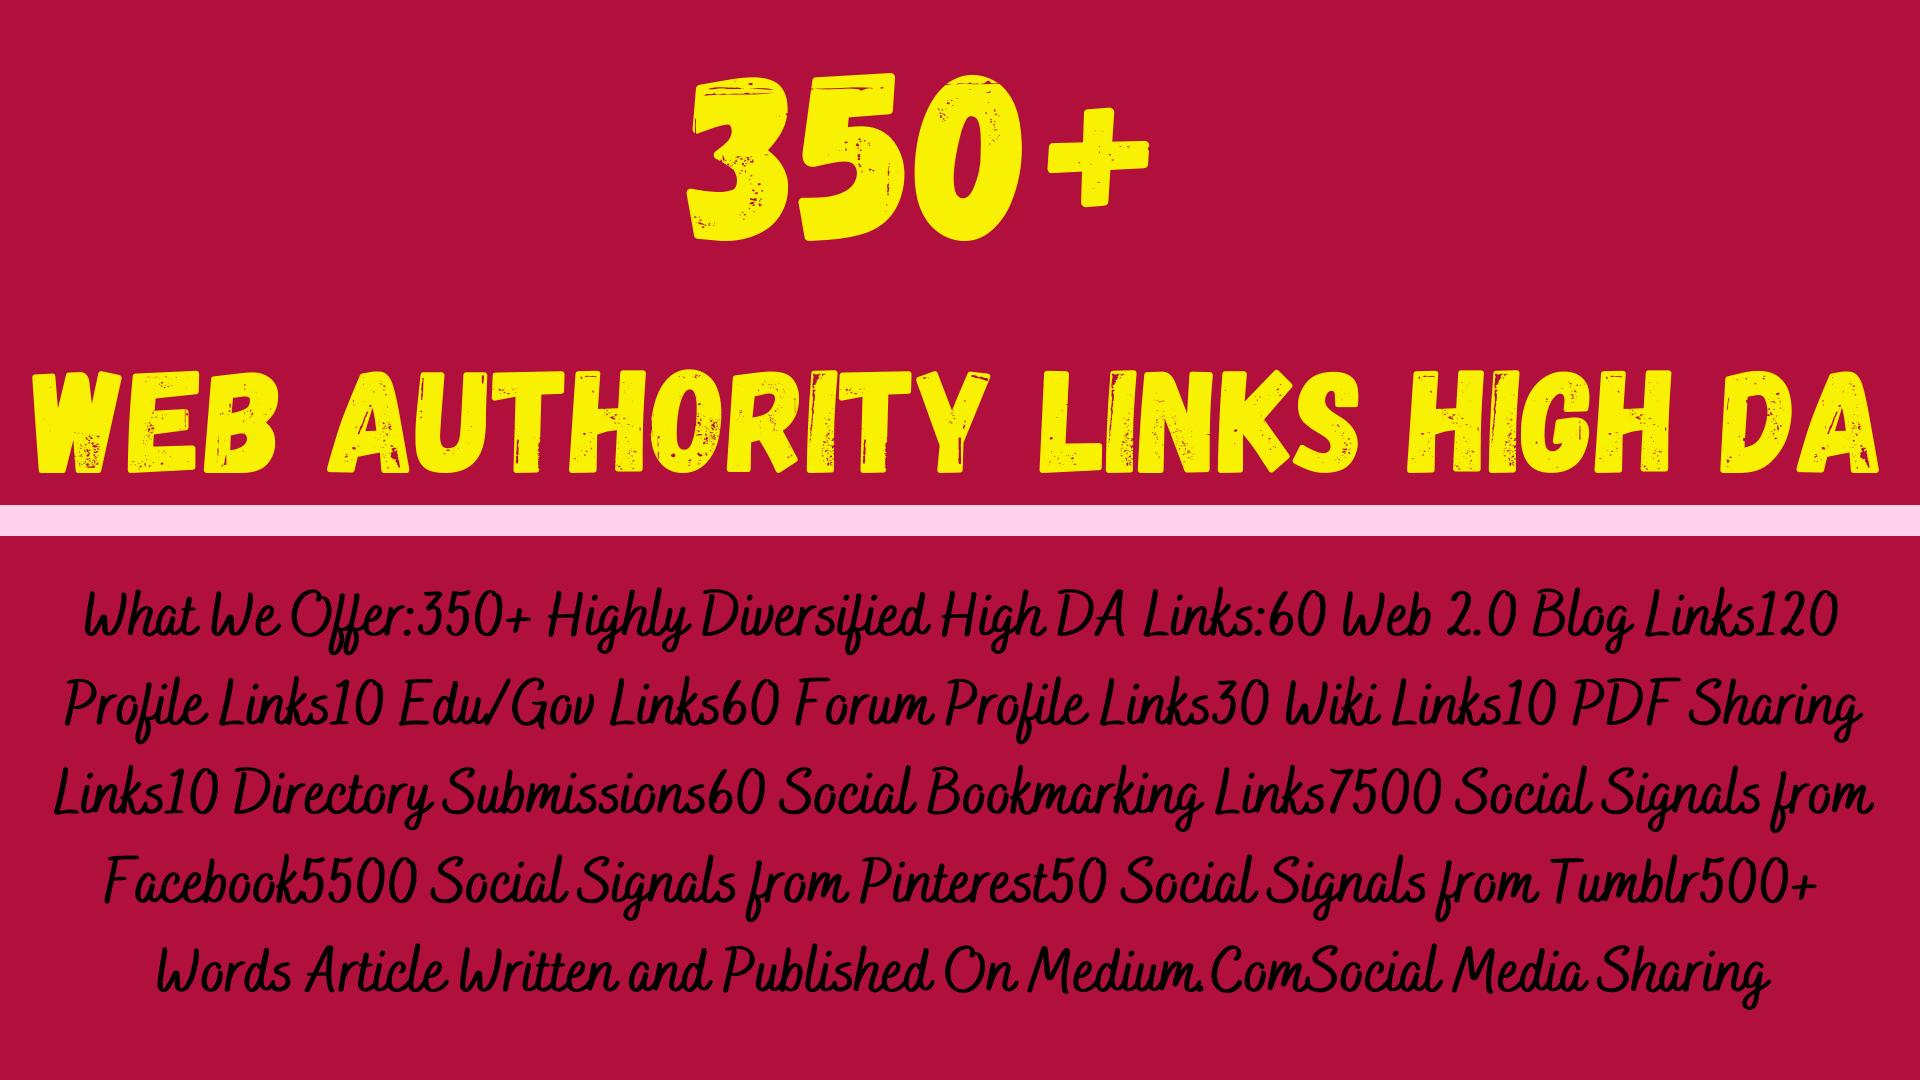 I will provide 350+ Web Authority Links High DA